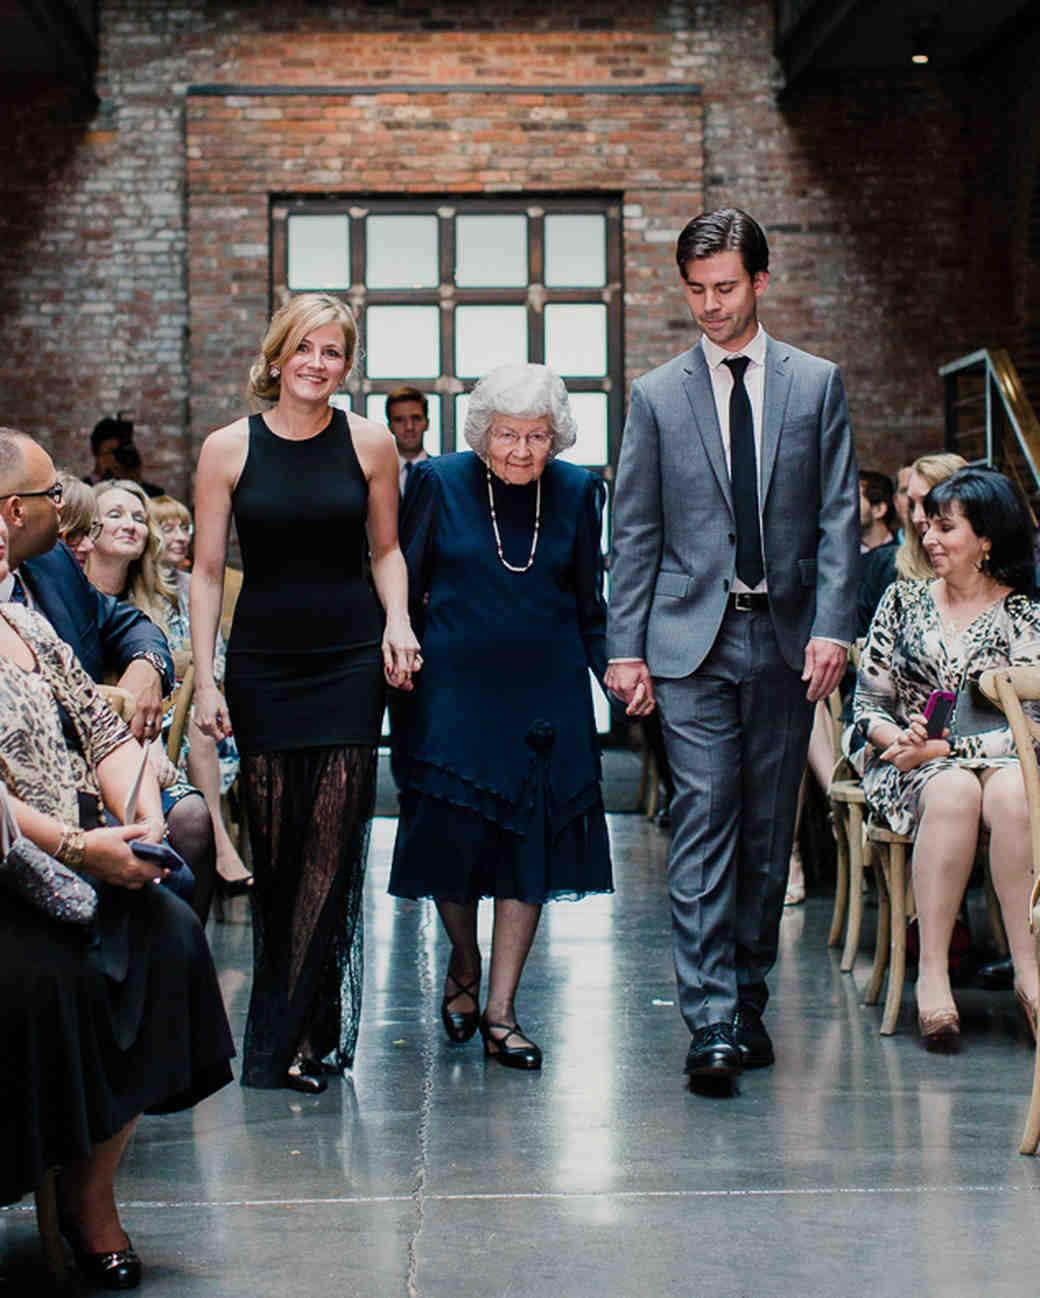 cristina-jason-wedding-processional-2222-s112017-0715.jpg